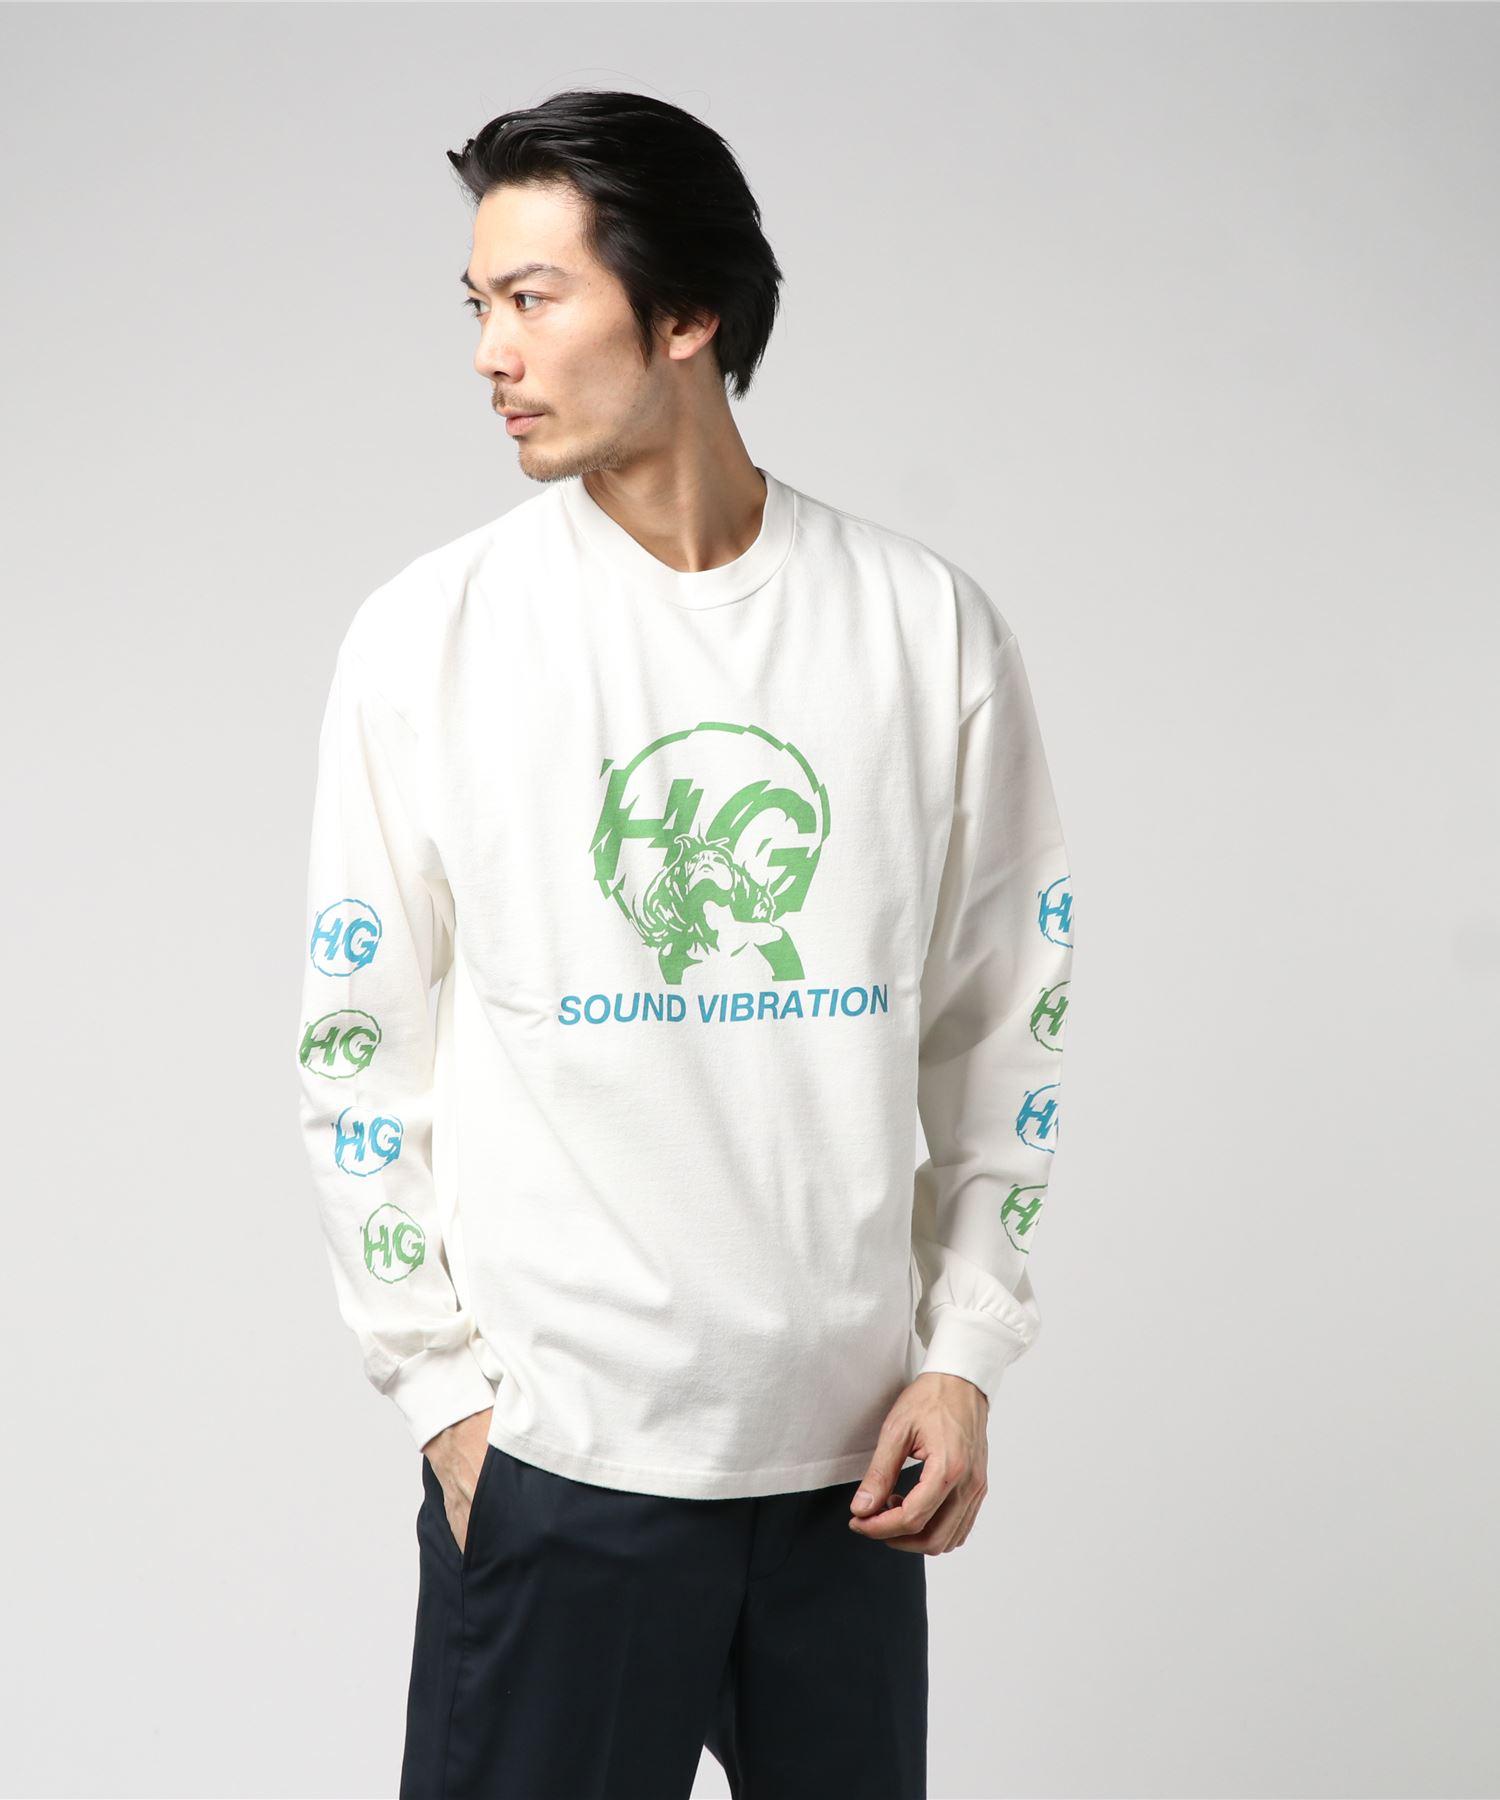 HG SOUND VIBRATIONリブ付Tシャツ